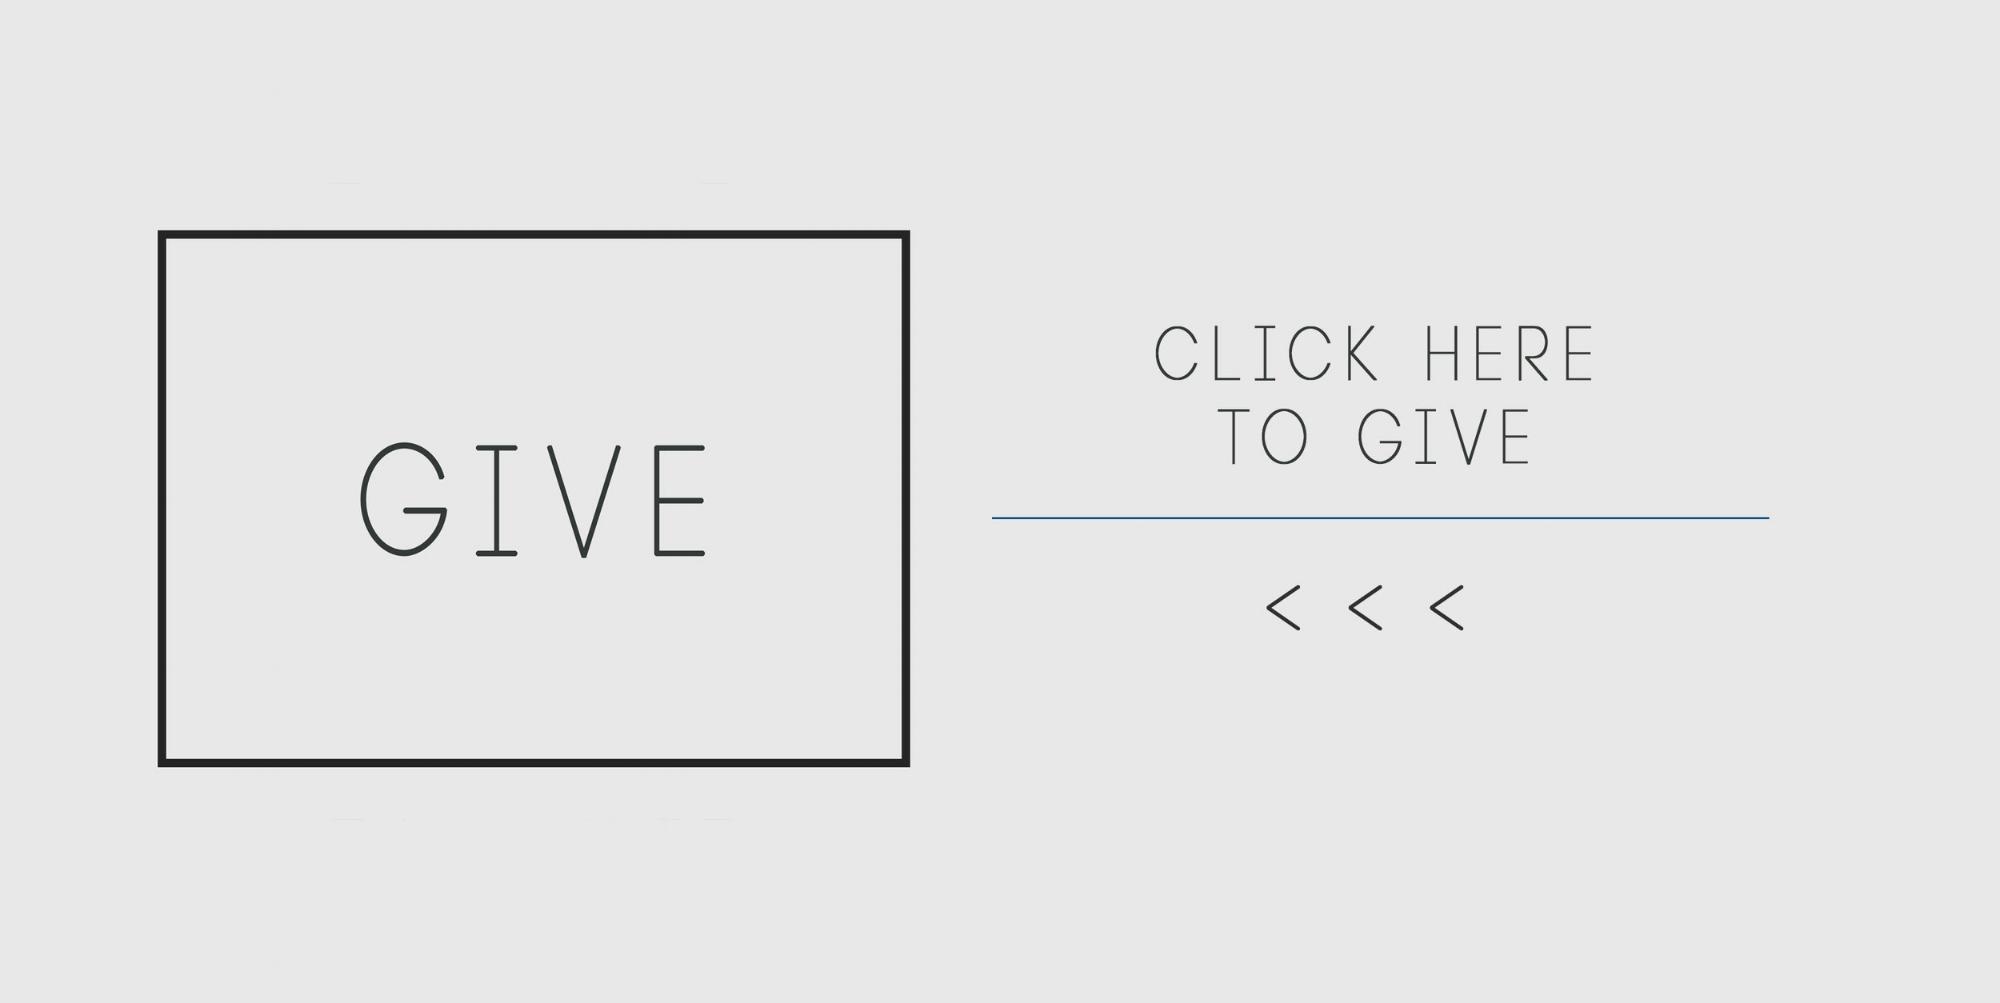 Give_ClickHere.jpg